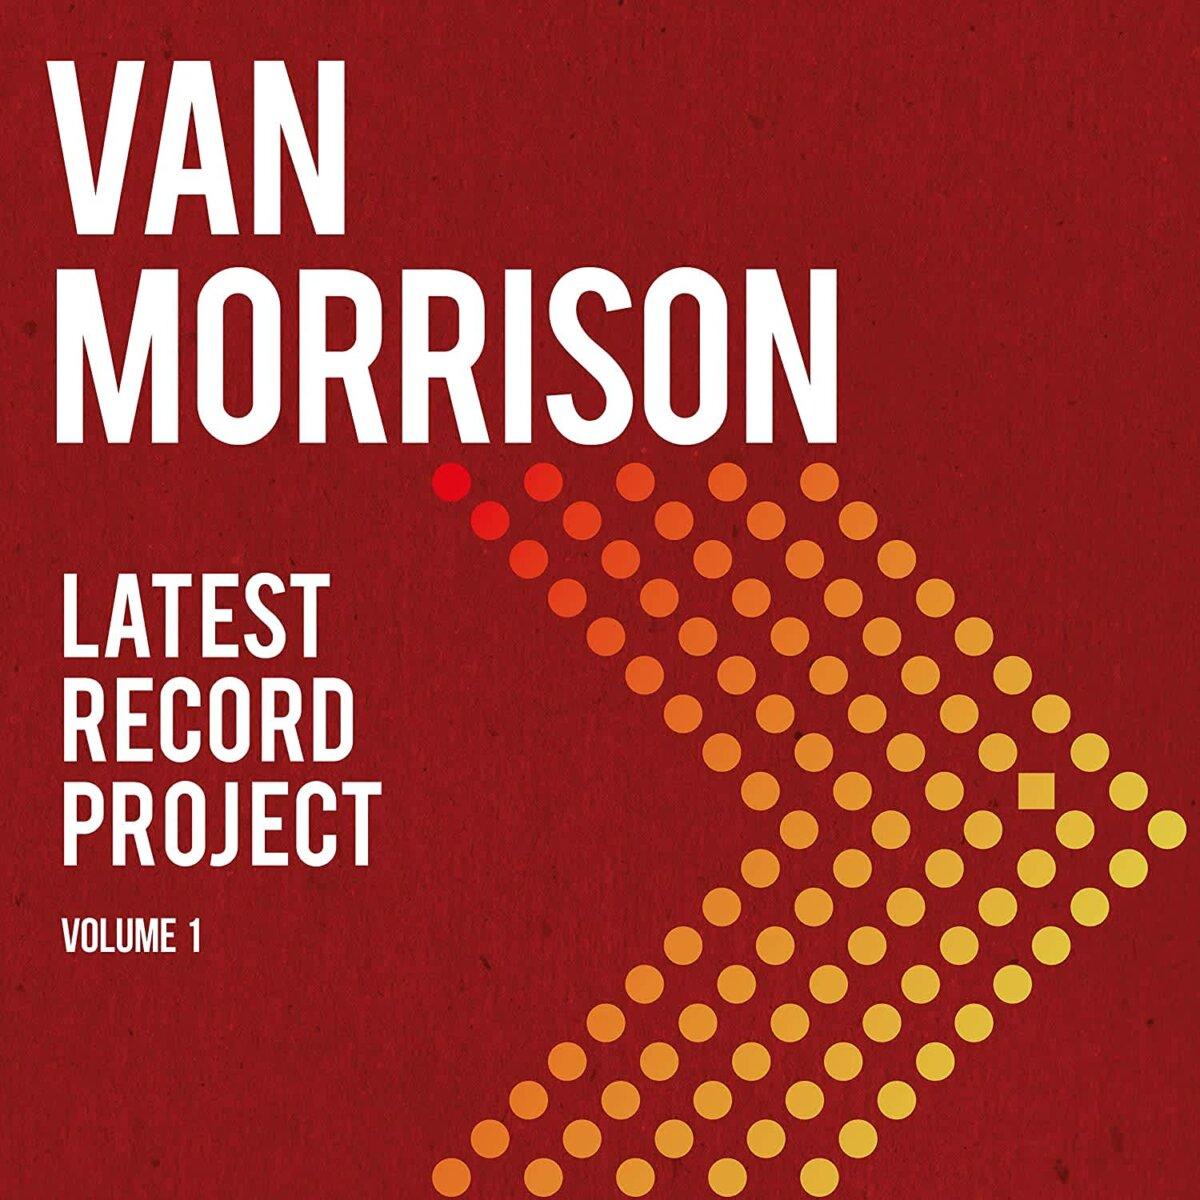 Van Morrison Latest Record Project Volume I